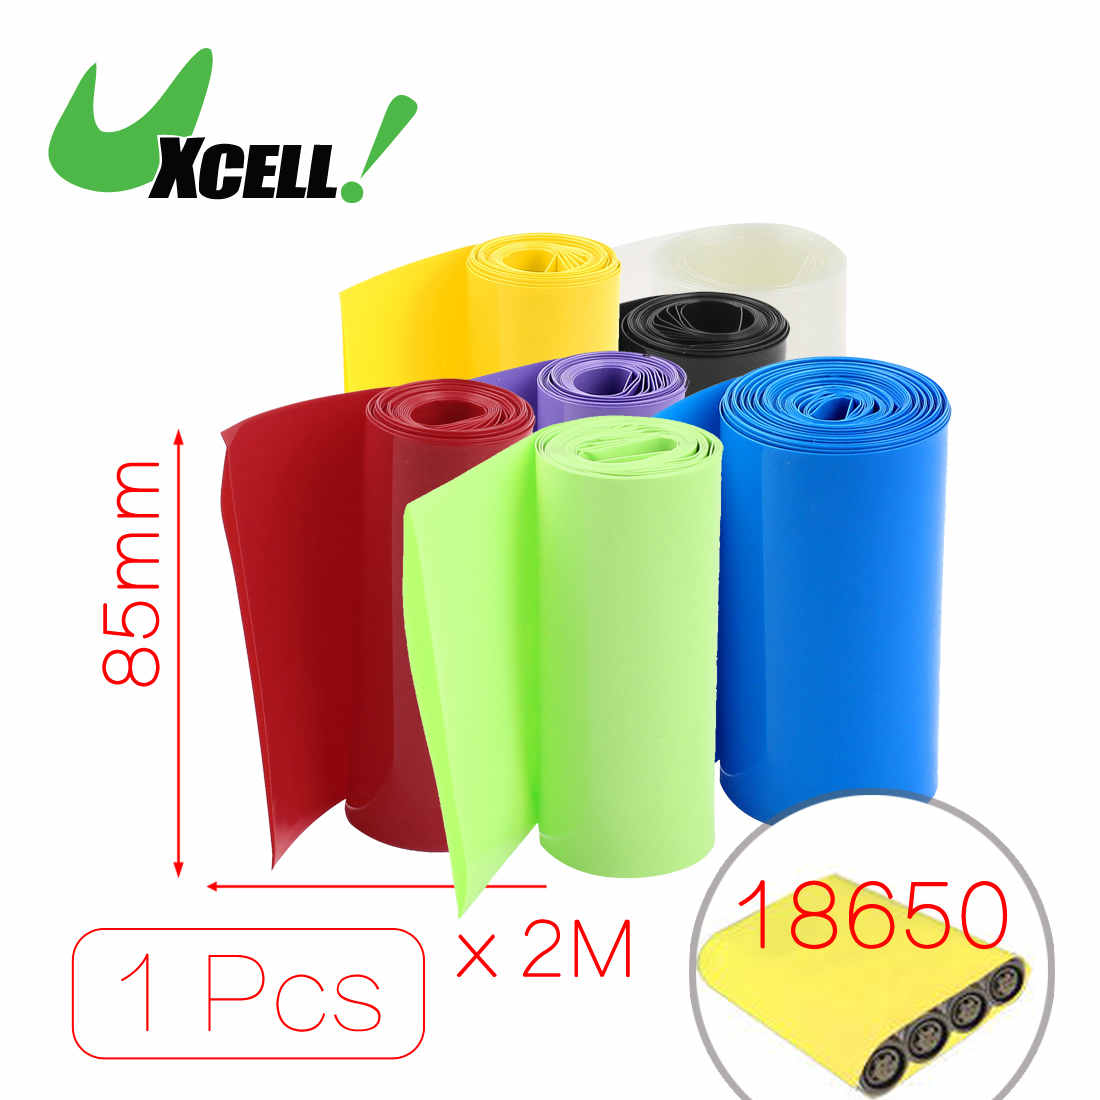 Uxcell 2Meters <font><b>85Mm</b></font> Width Pvc Heat <font><b>Shrink</b></font> Wrap <font><b>Tube</b></font> Blue For 18650 <font><b>Battery</b></font> Pack .   black   blue   clear   green   purple   red